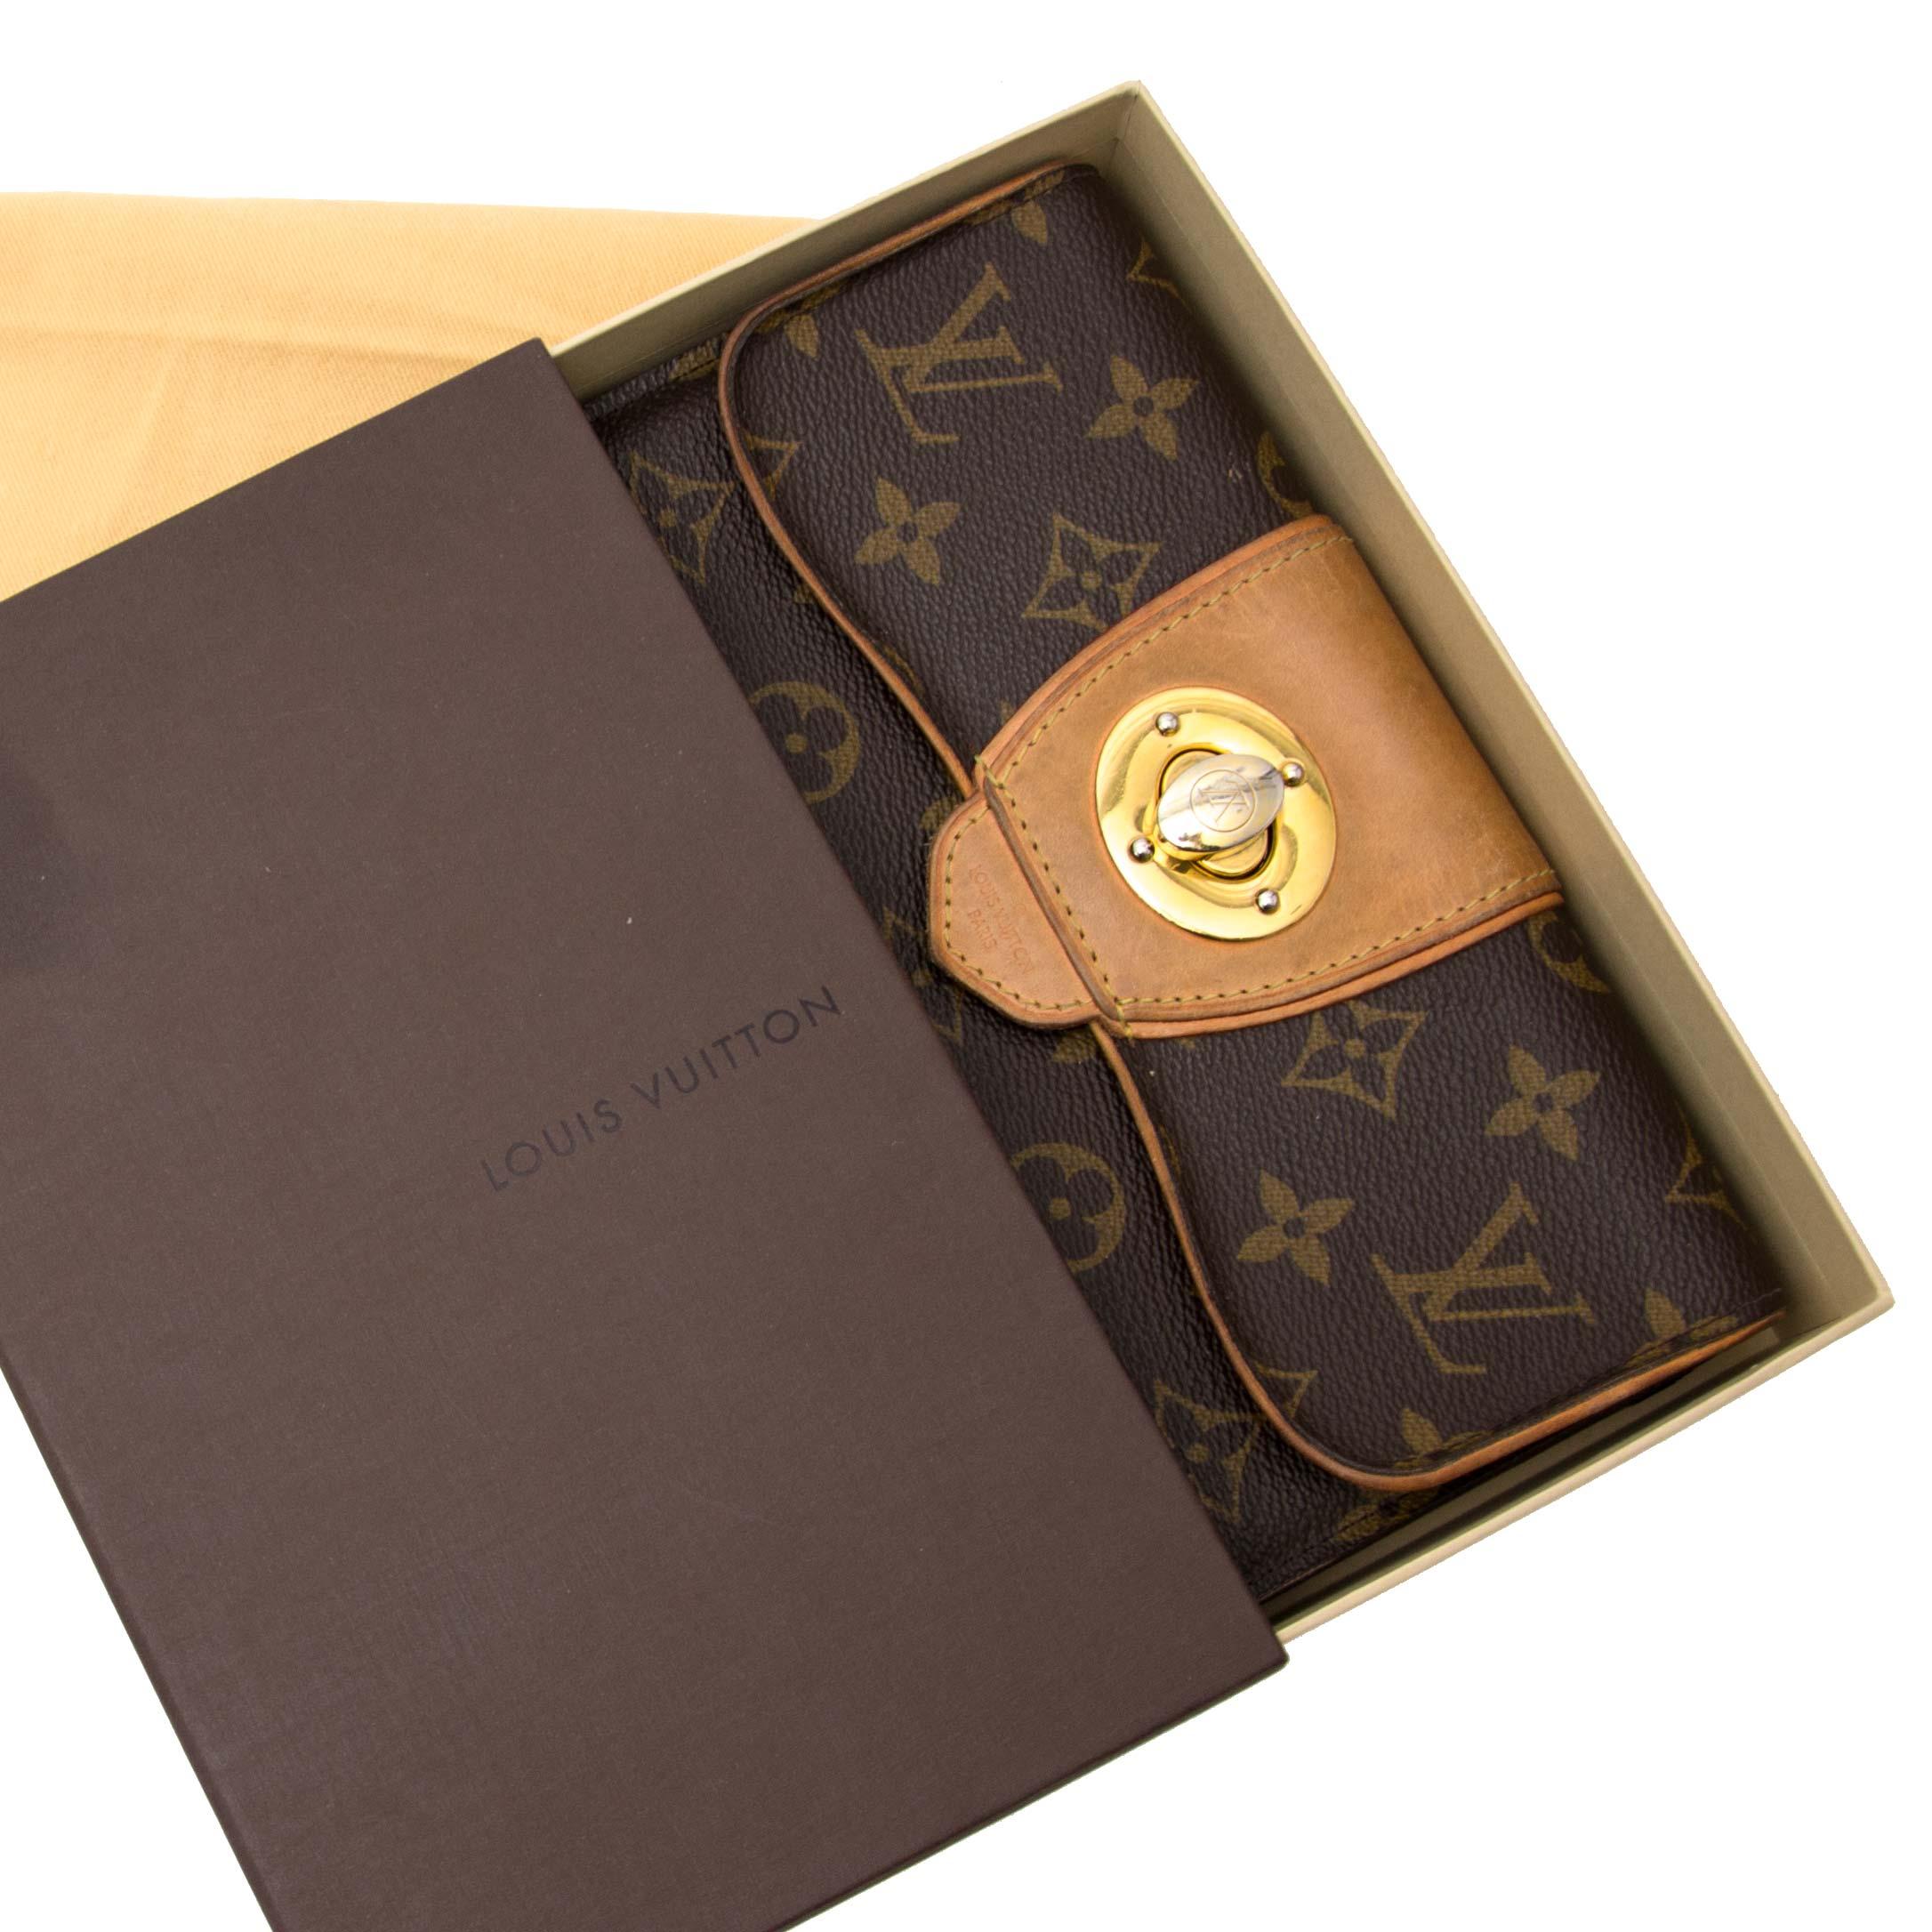 Louis Vuitton Boetie Wallet